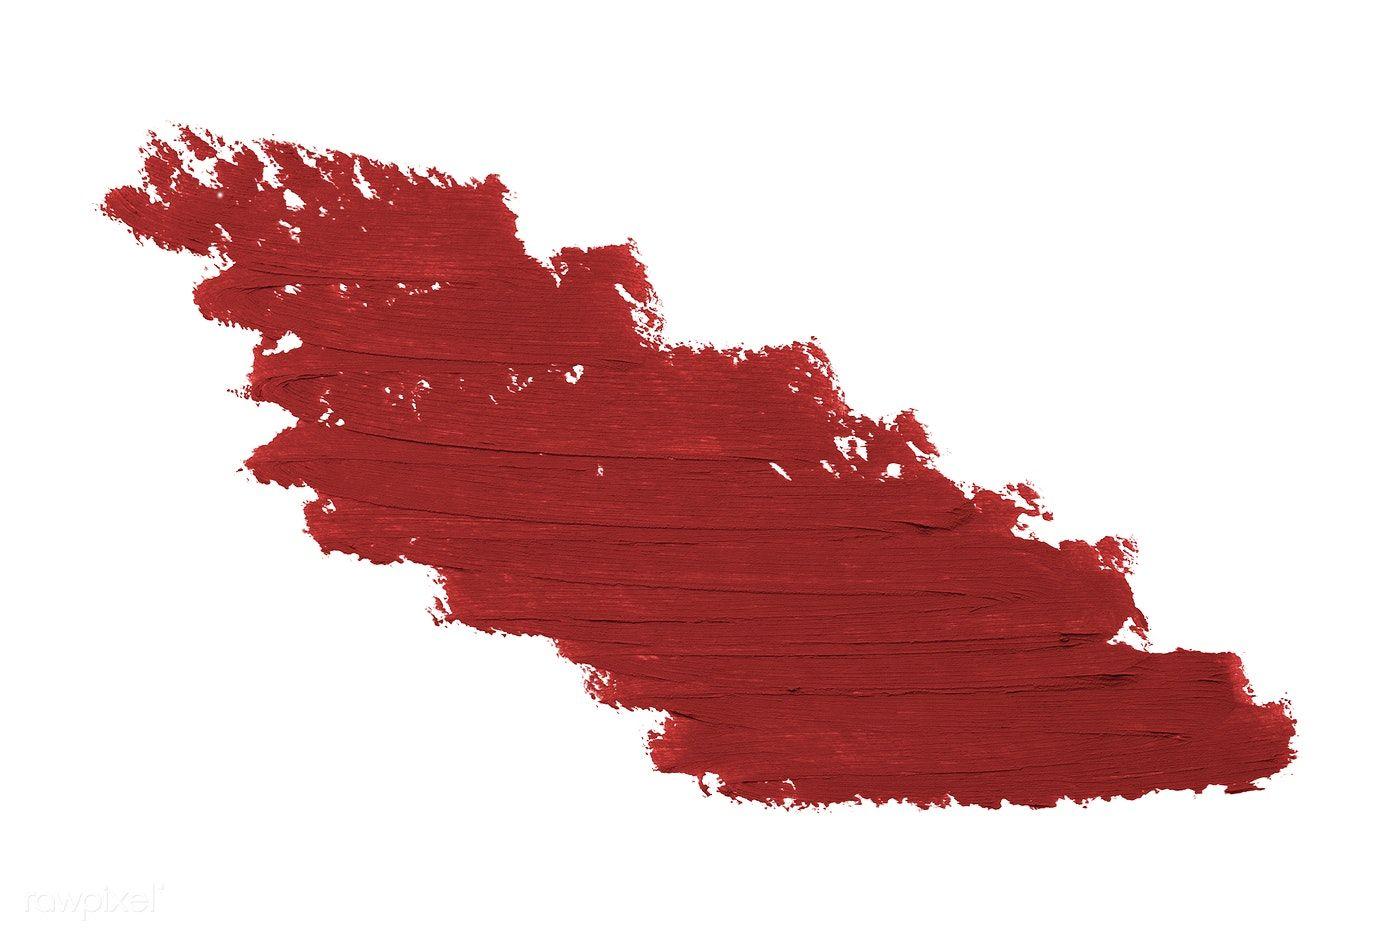 Download Premium Psd Of Red Lipstick Smudge Badge Background 552965 Lipstick Smudge Pink Lipstick Smudging